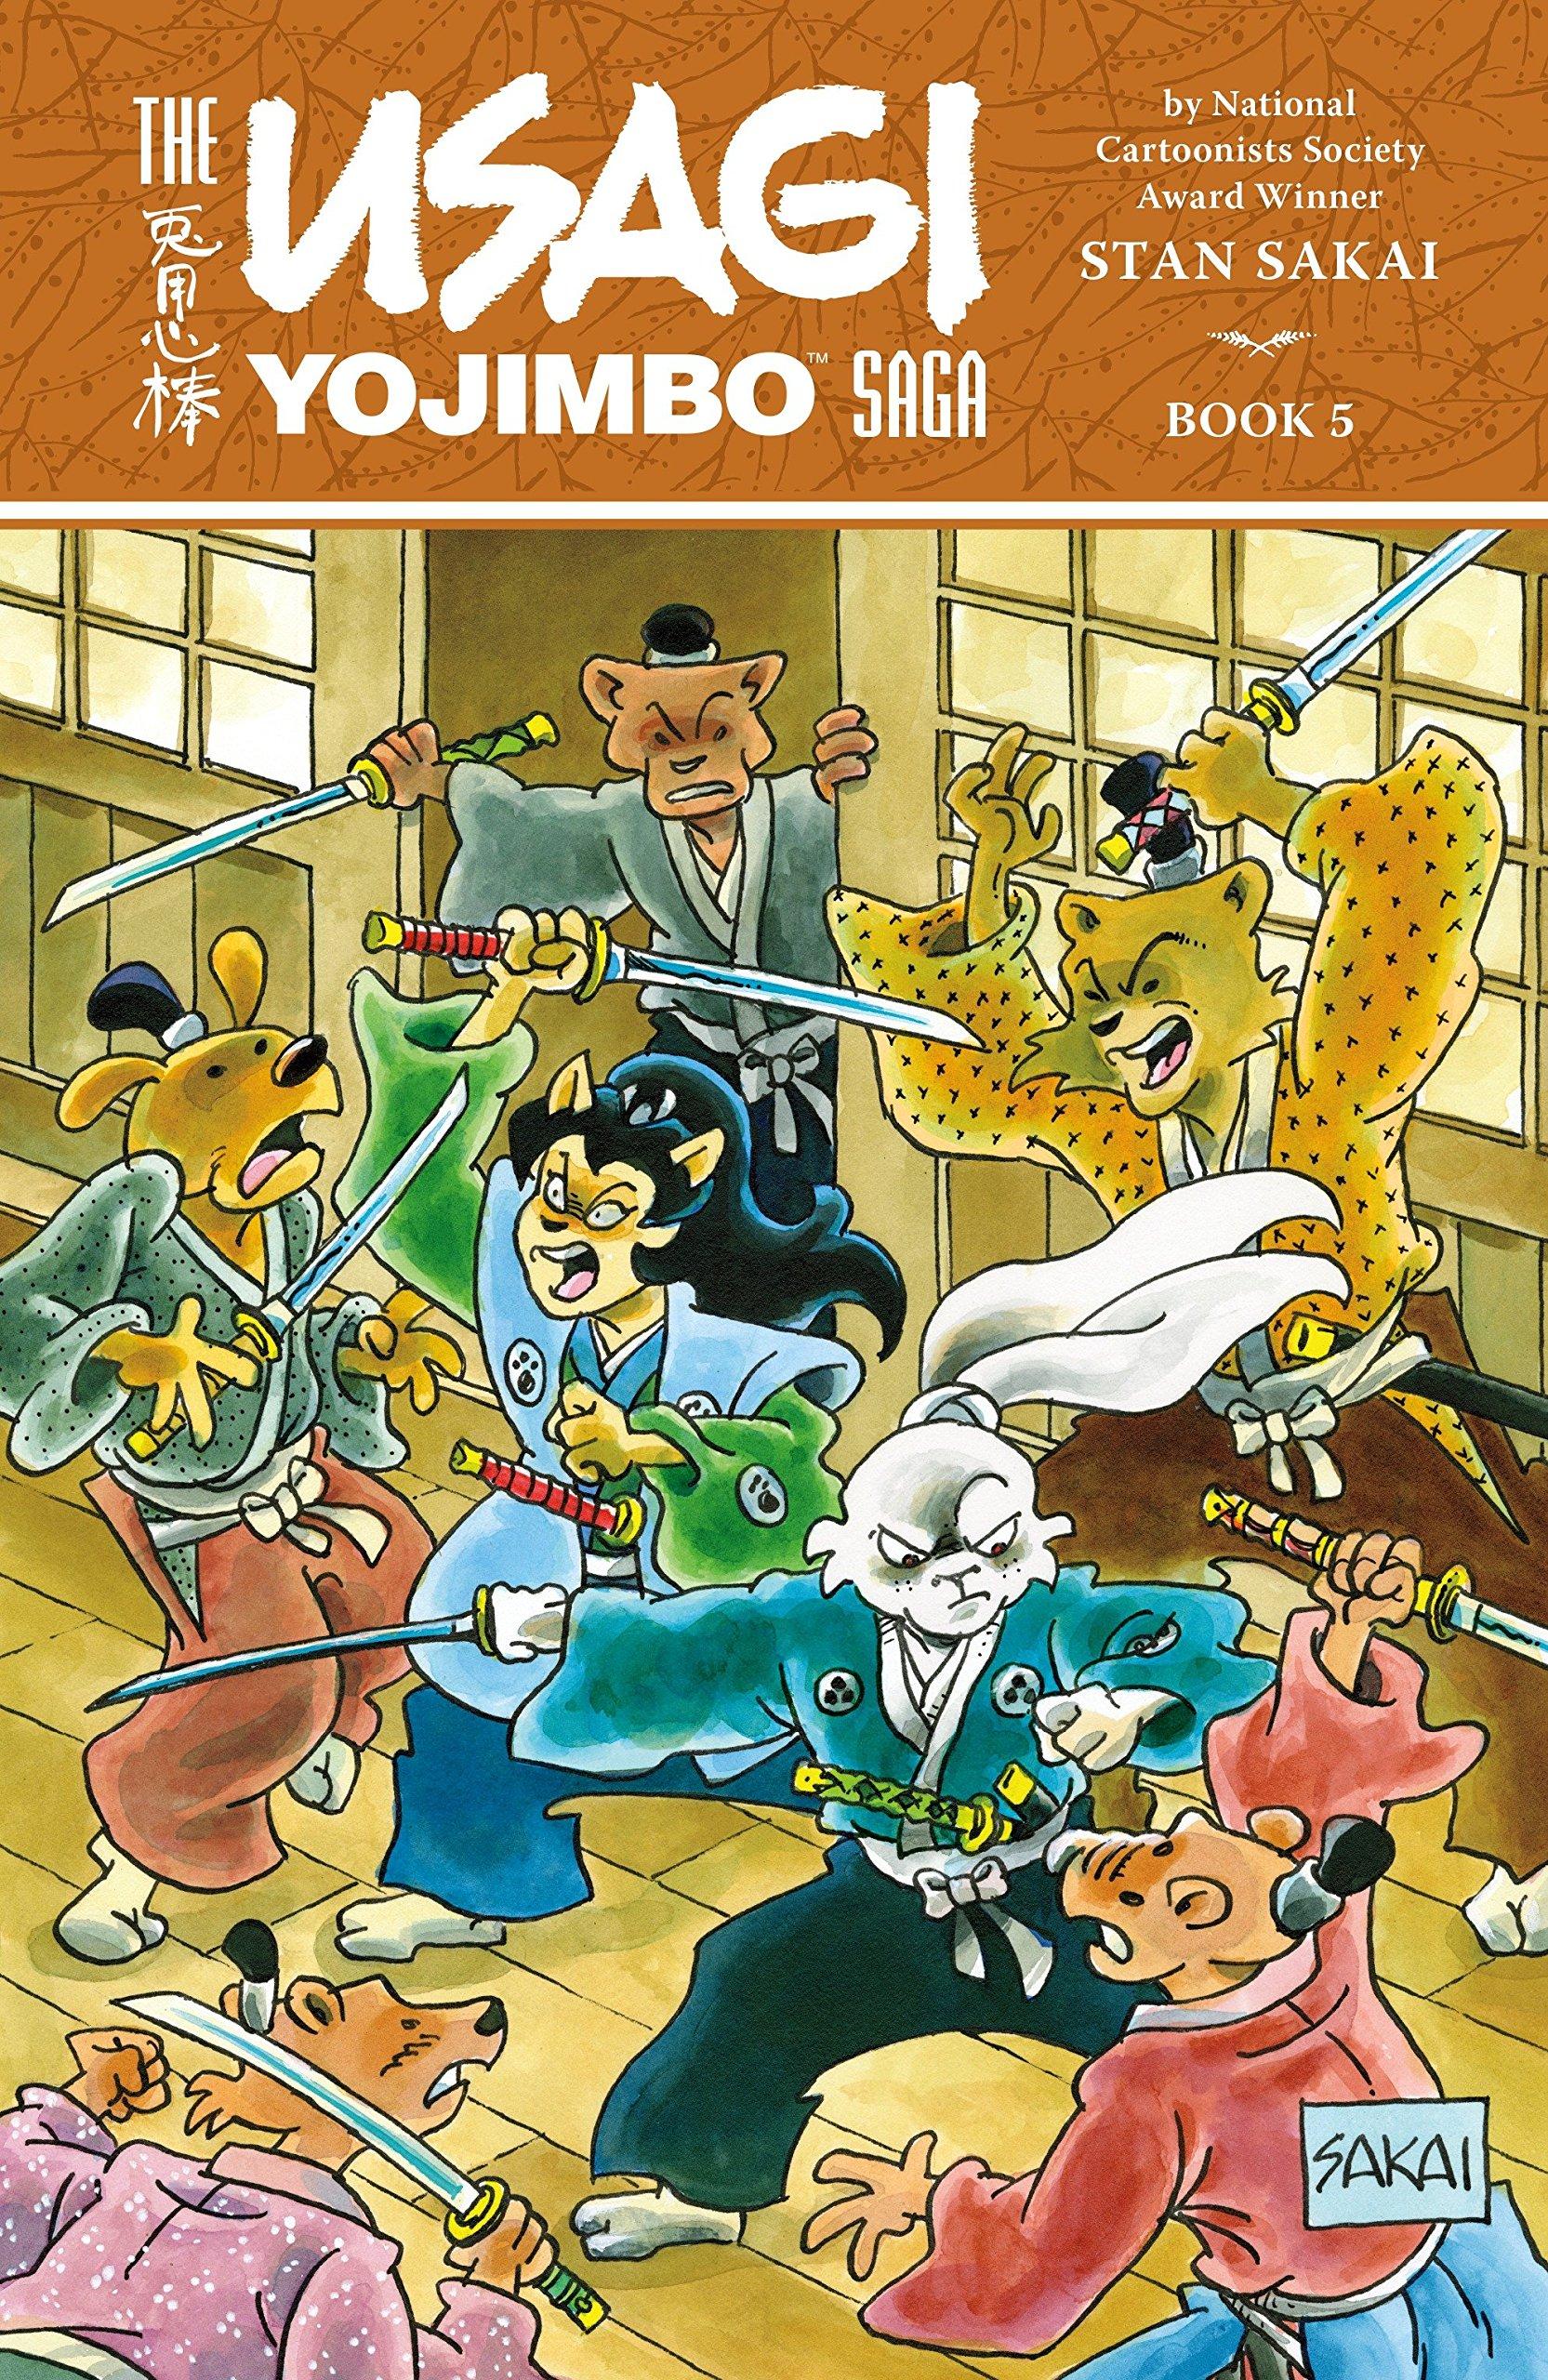 Usagi Yojimbo Saga Volume 5 ebook